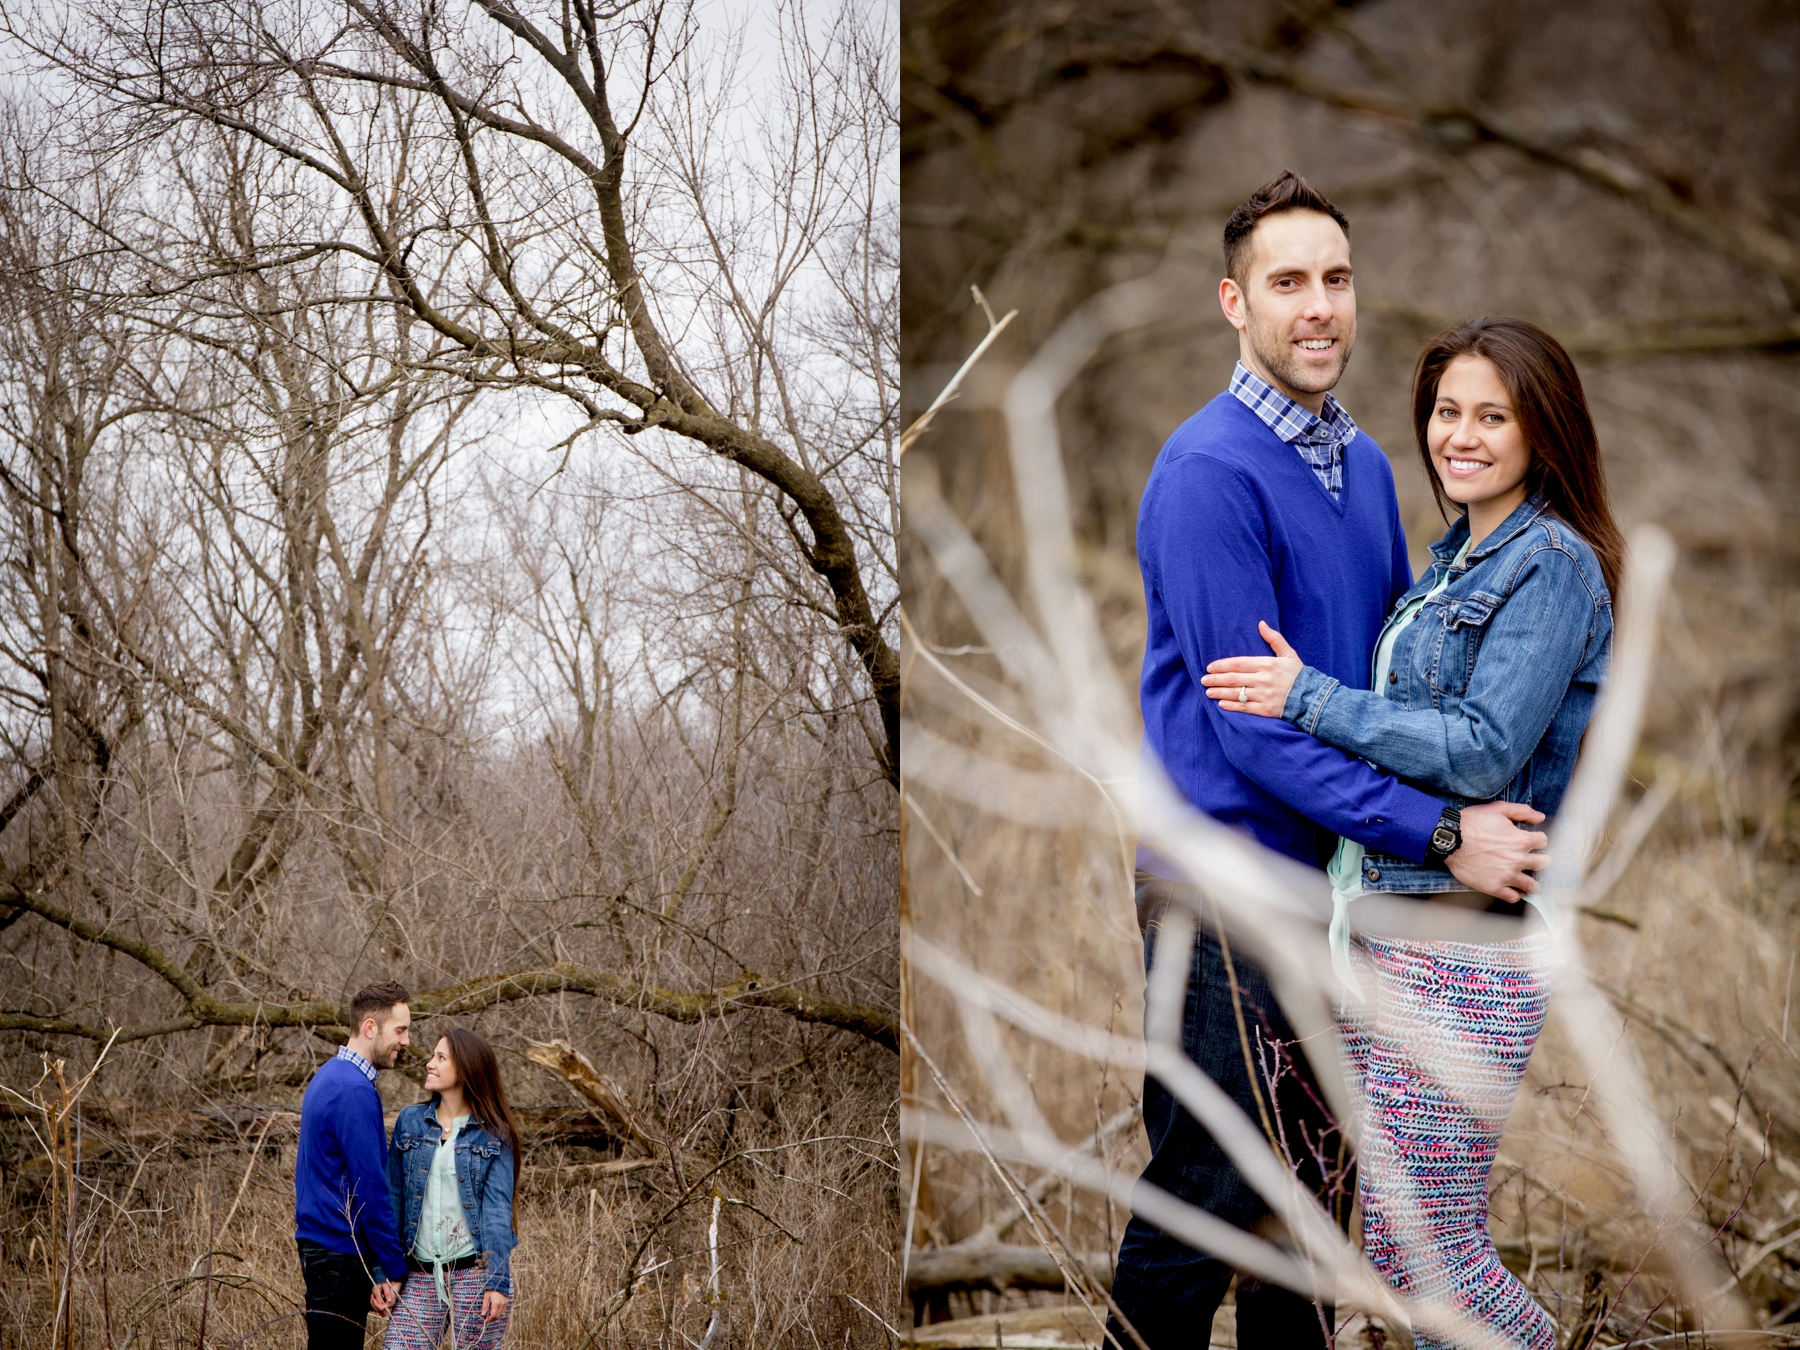 Brandon_Shafer_Photography_Kim_Nick_Engagement_0008.jpg